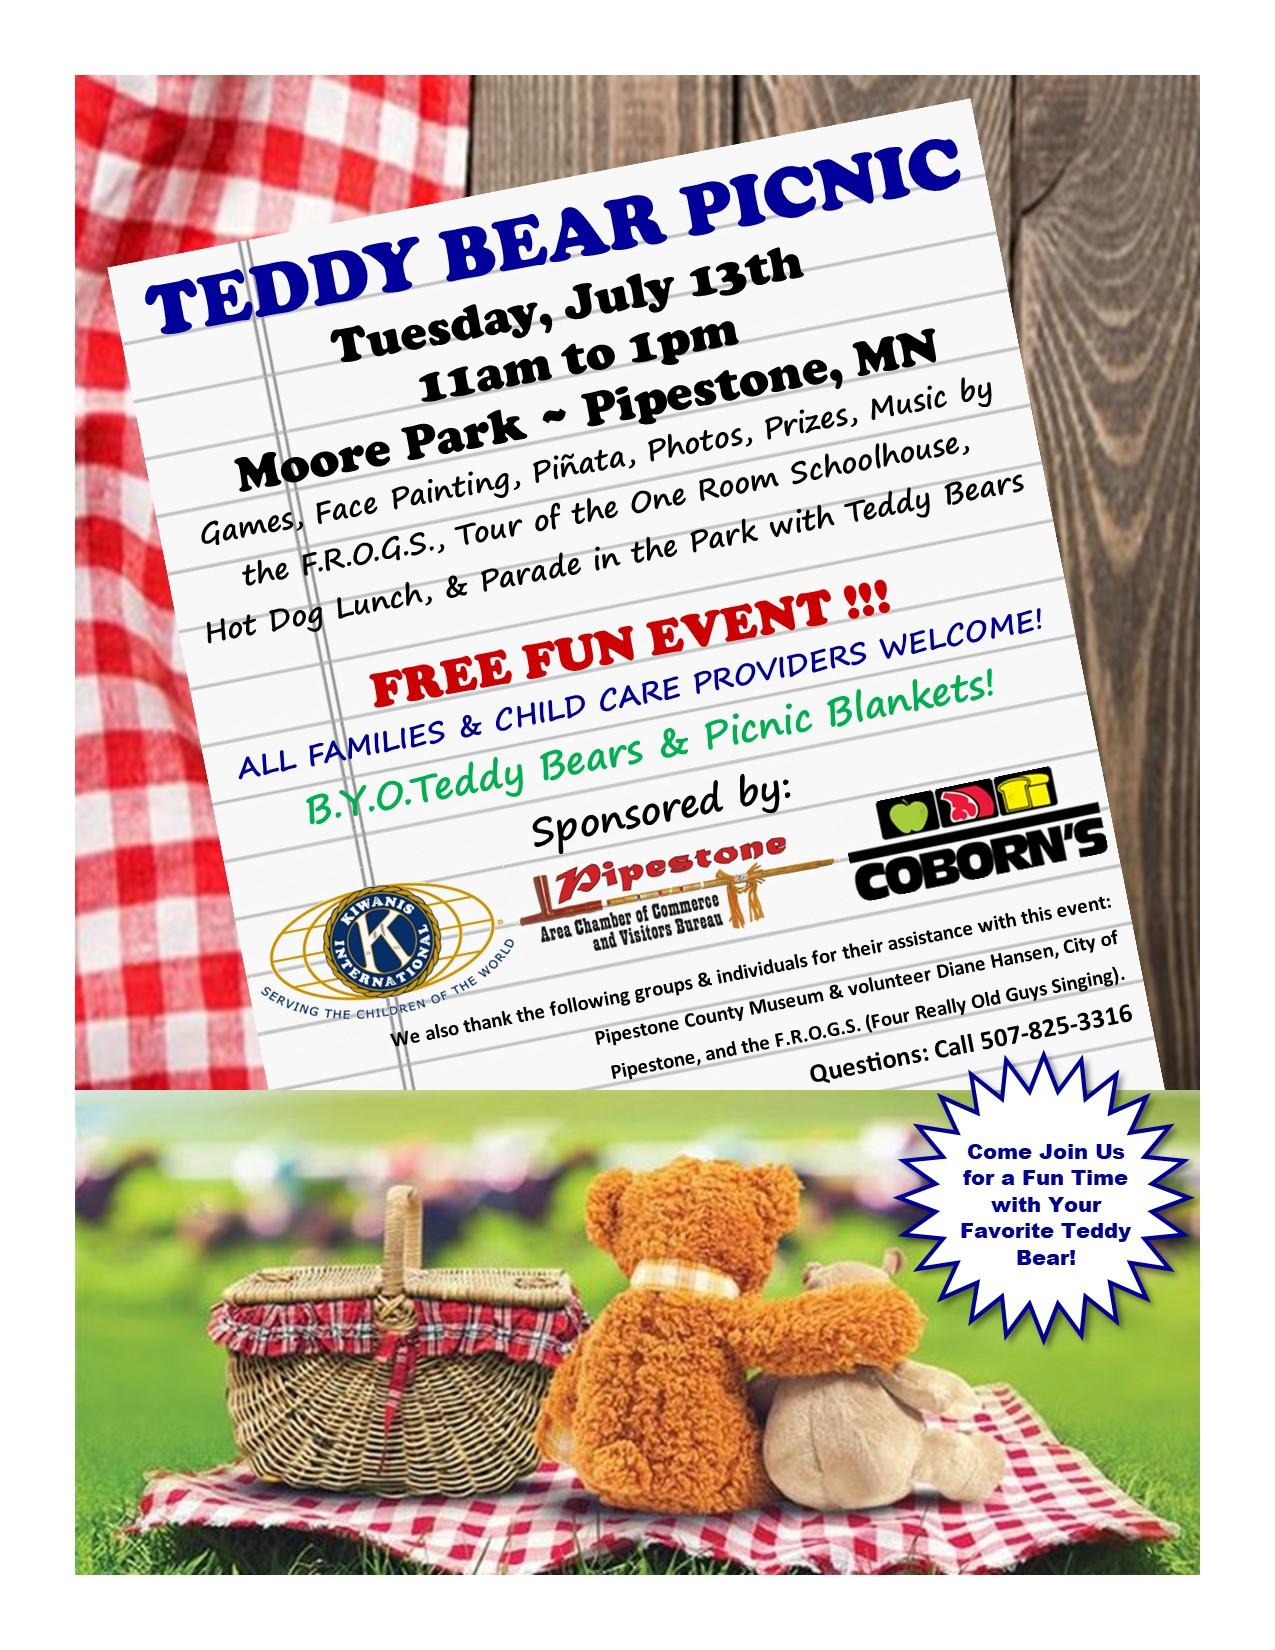 Teddy Bear Picnic Flyer